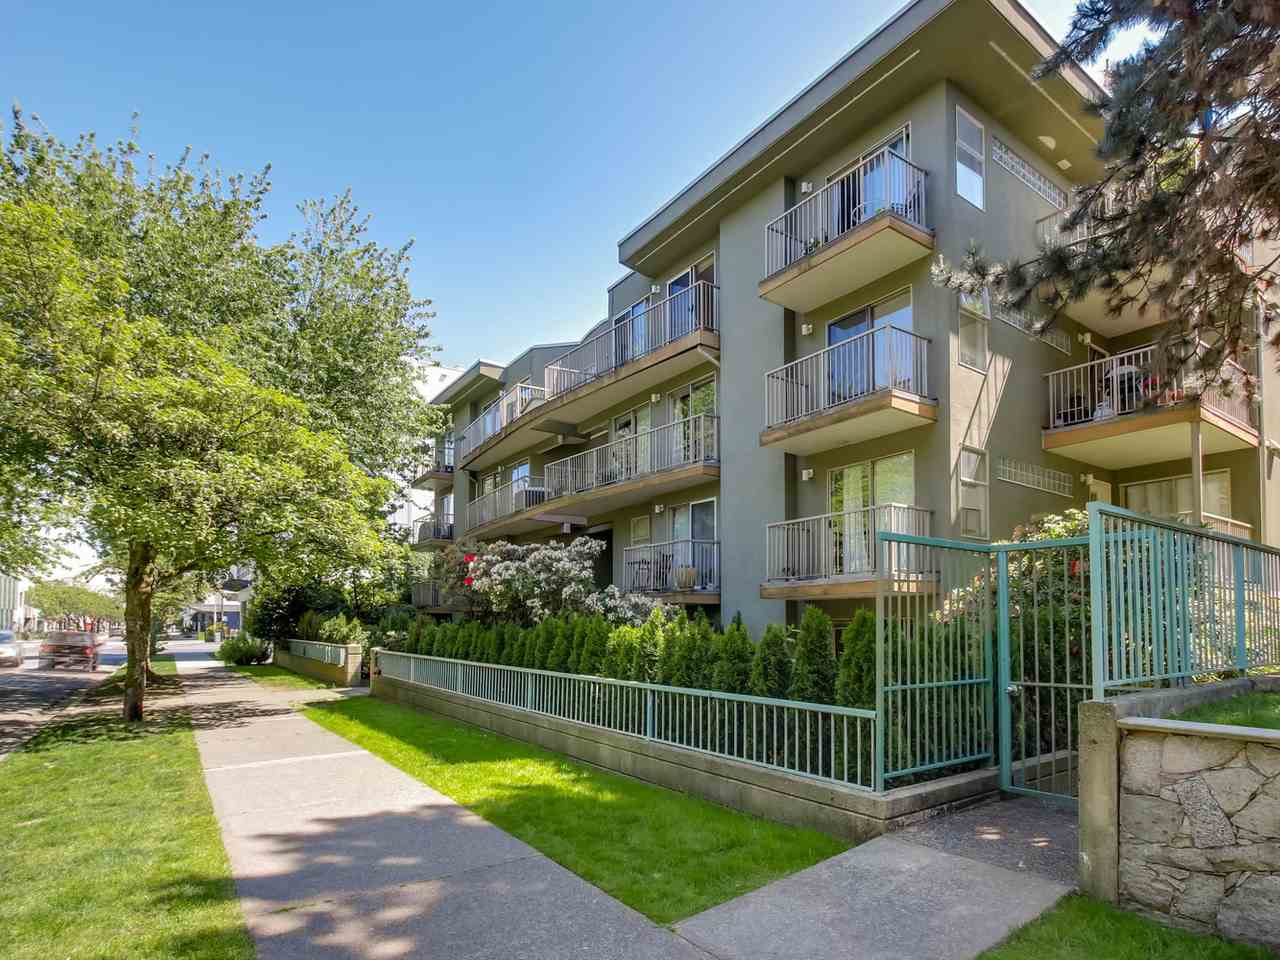 101 1820 W 3RD AVENUE, Vancouver, BC, V6J 1K8 Primary Photo